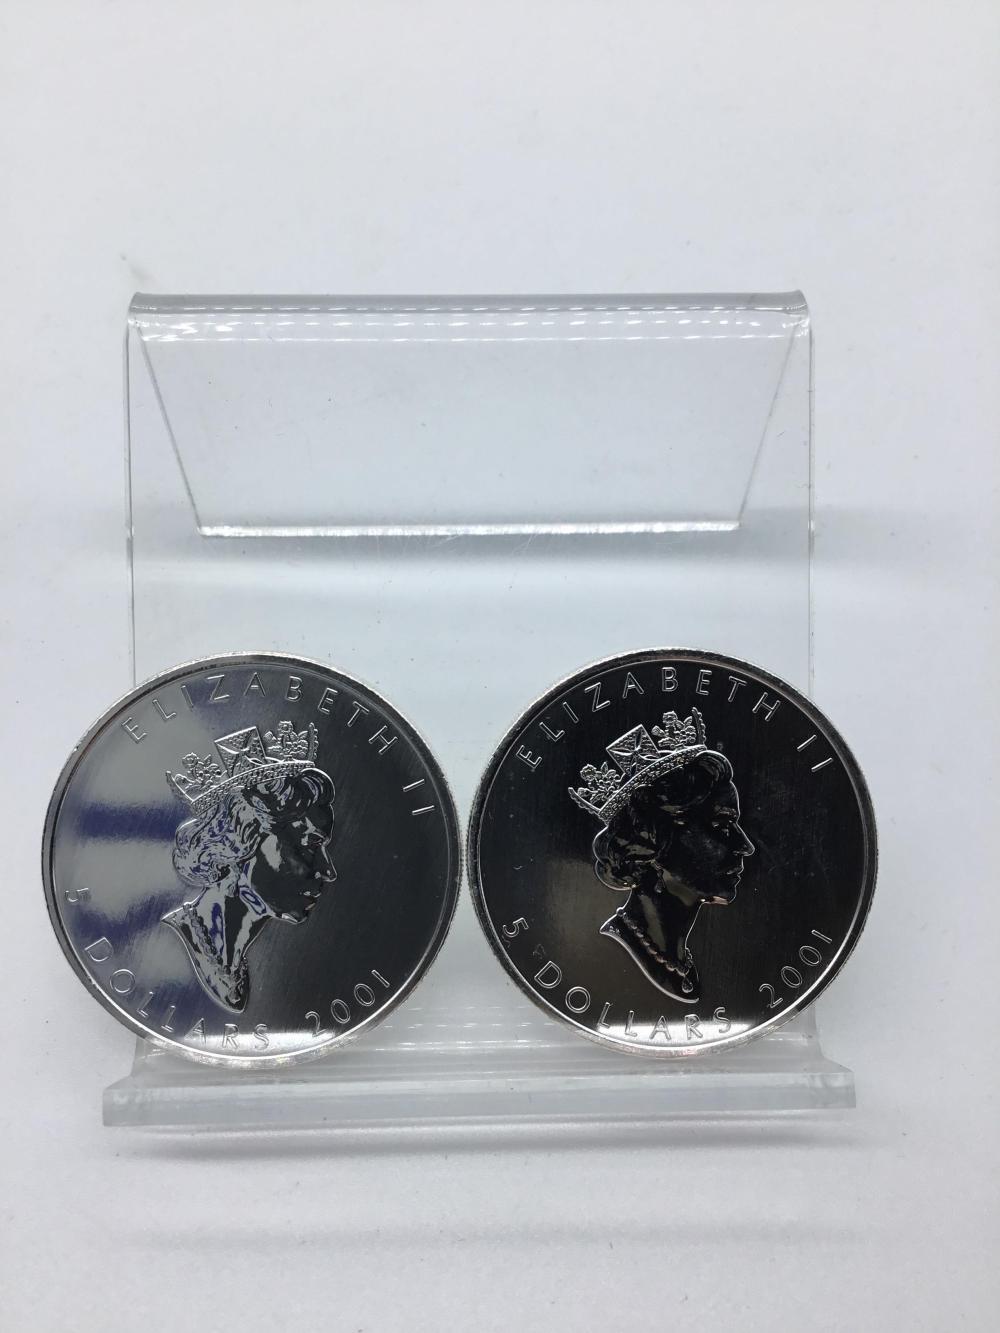 2011 Canadian Maple leaf silver $5